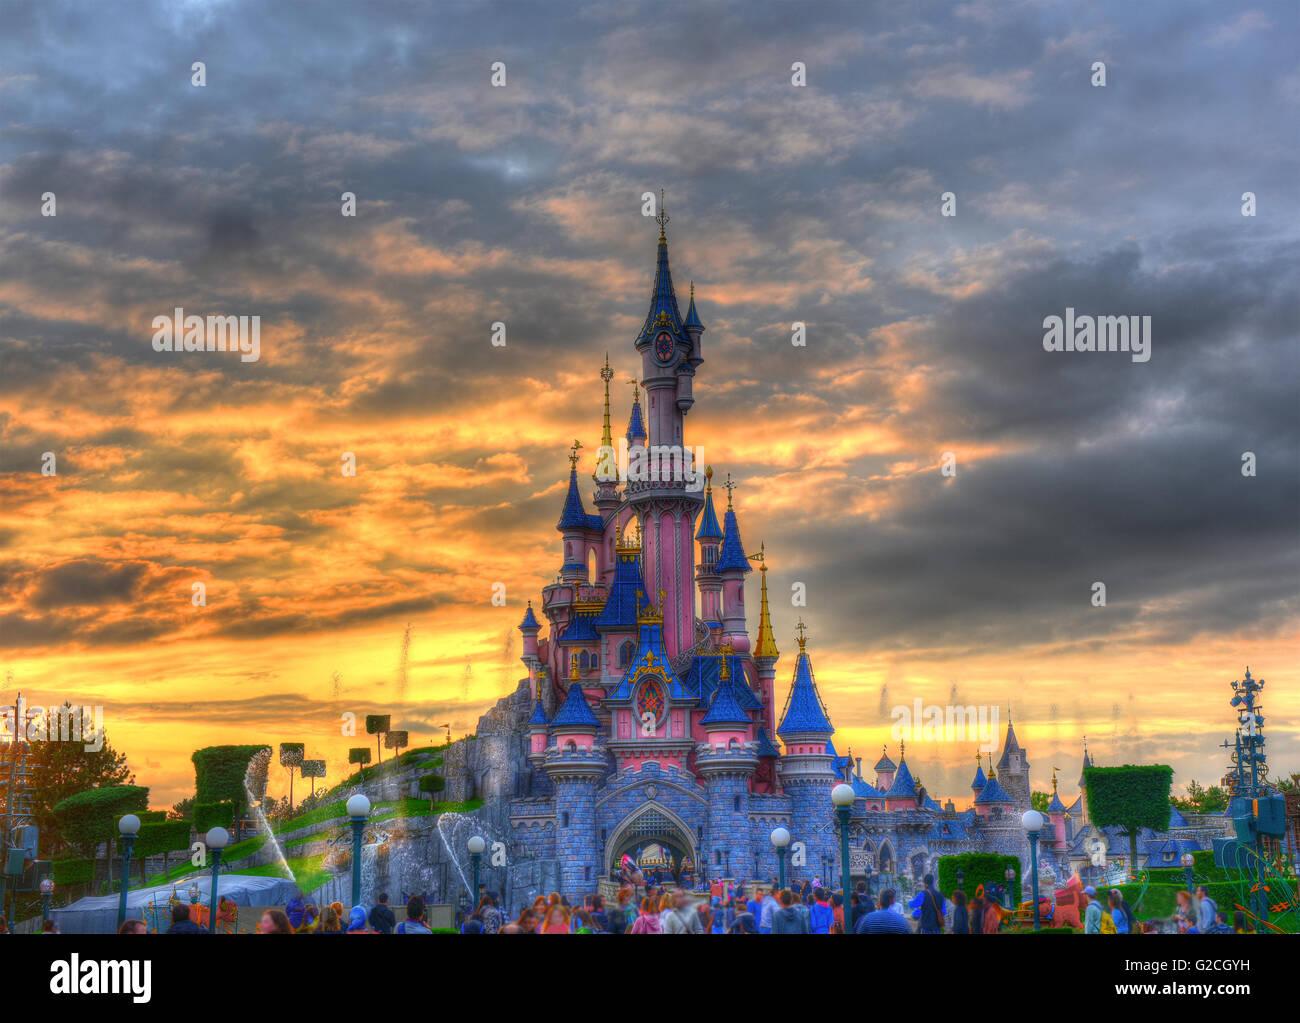 Disneyland Paris at sunset Stock Photo